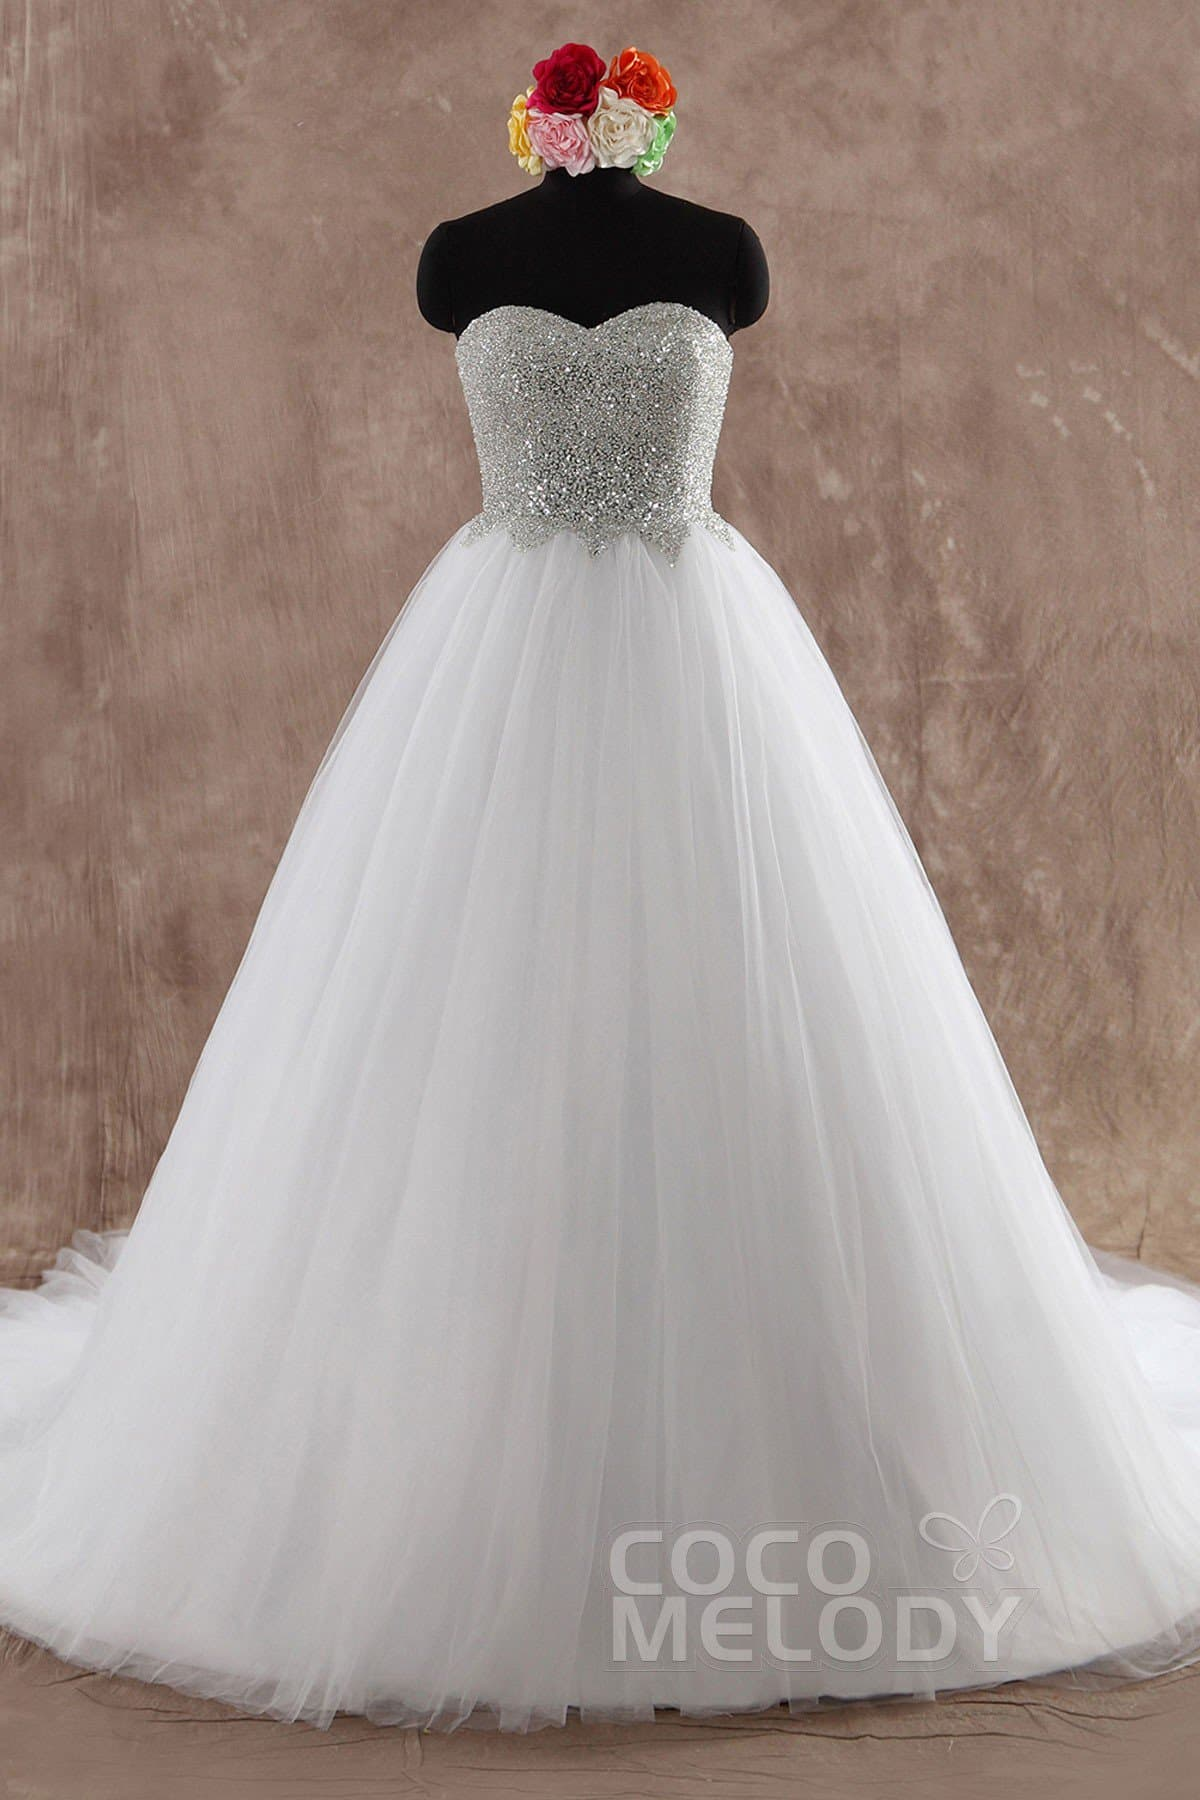 99.00 wedding dresses photo - 1